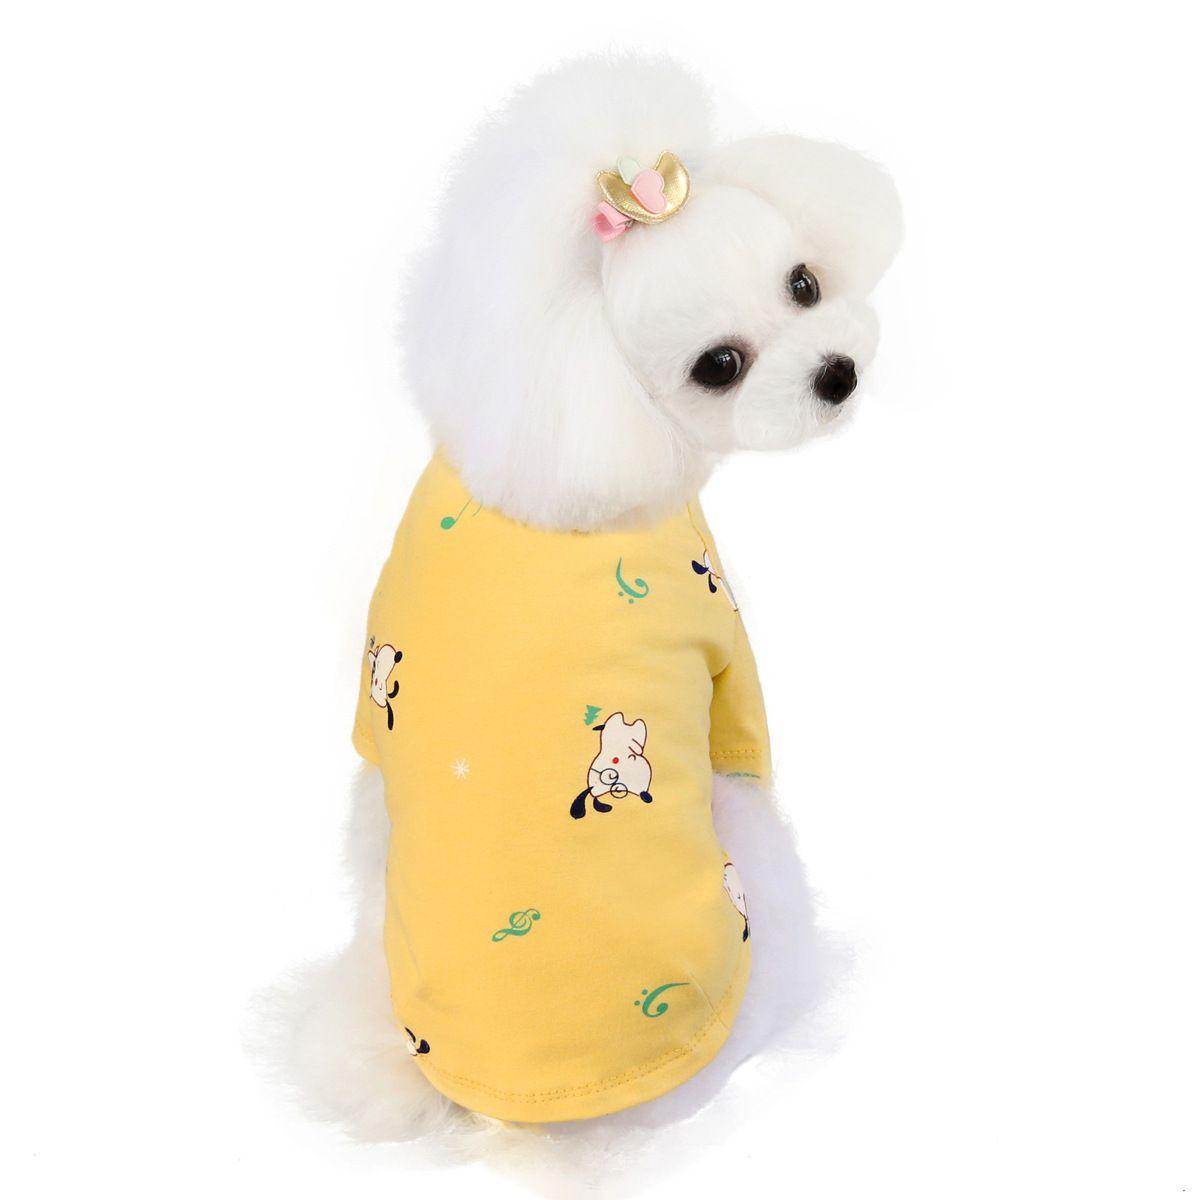 Sublimación reflector en blanco Nylon chaleco para perros mascotas ropa de malla transpirable ajustable camisa creativa camisa de verano TUXEDO Suministros de perro para mascotas Clo